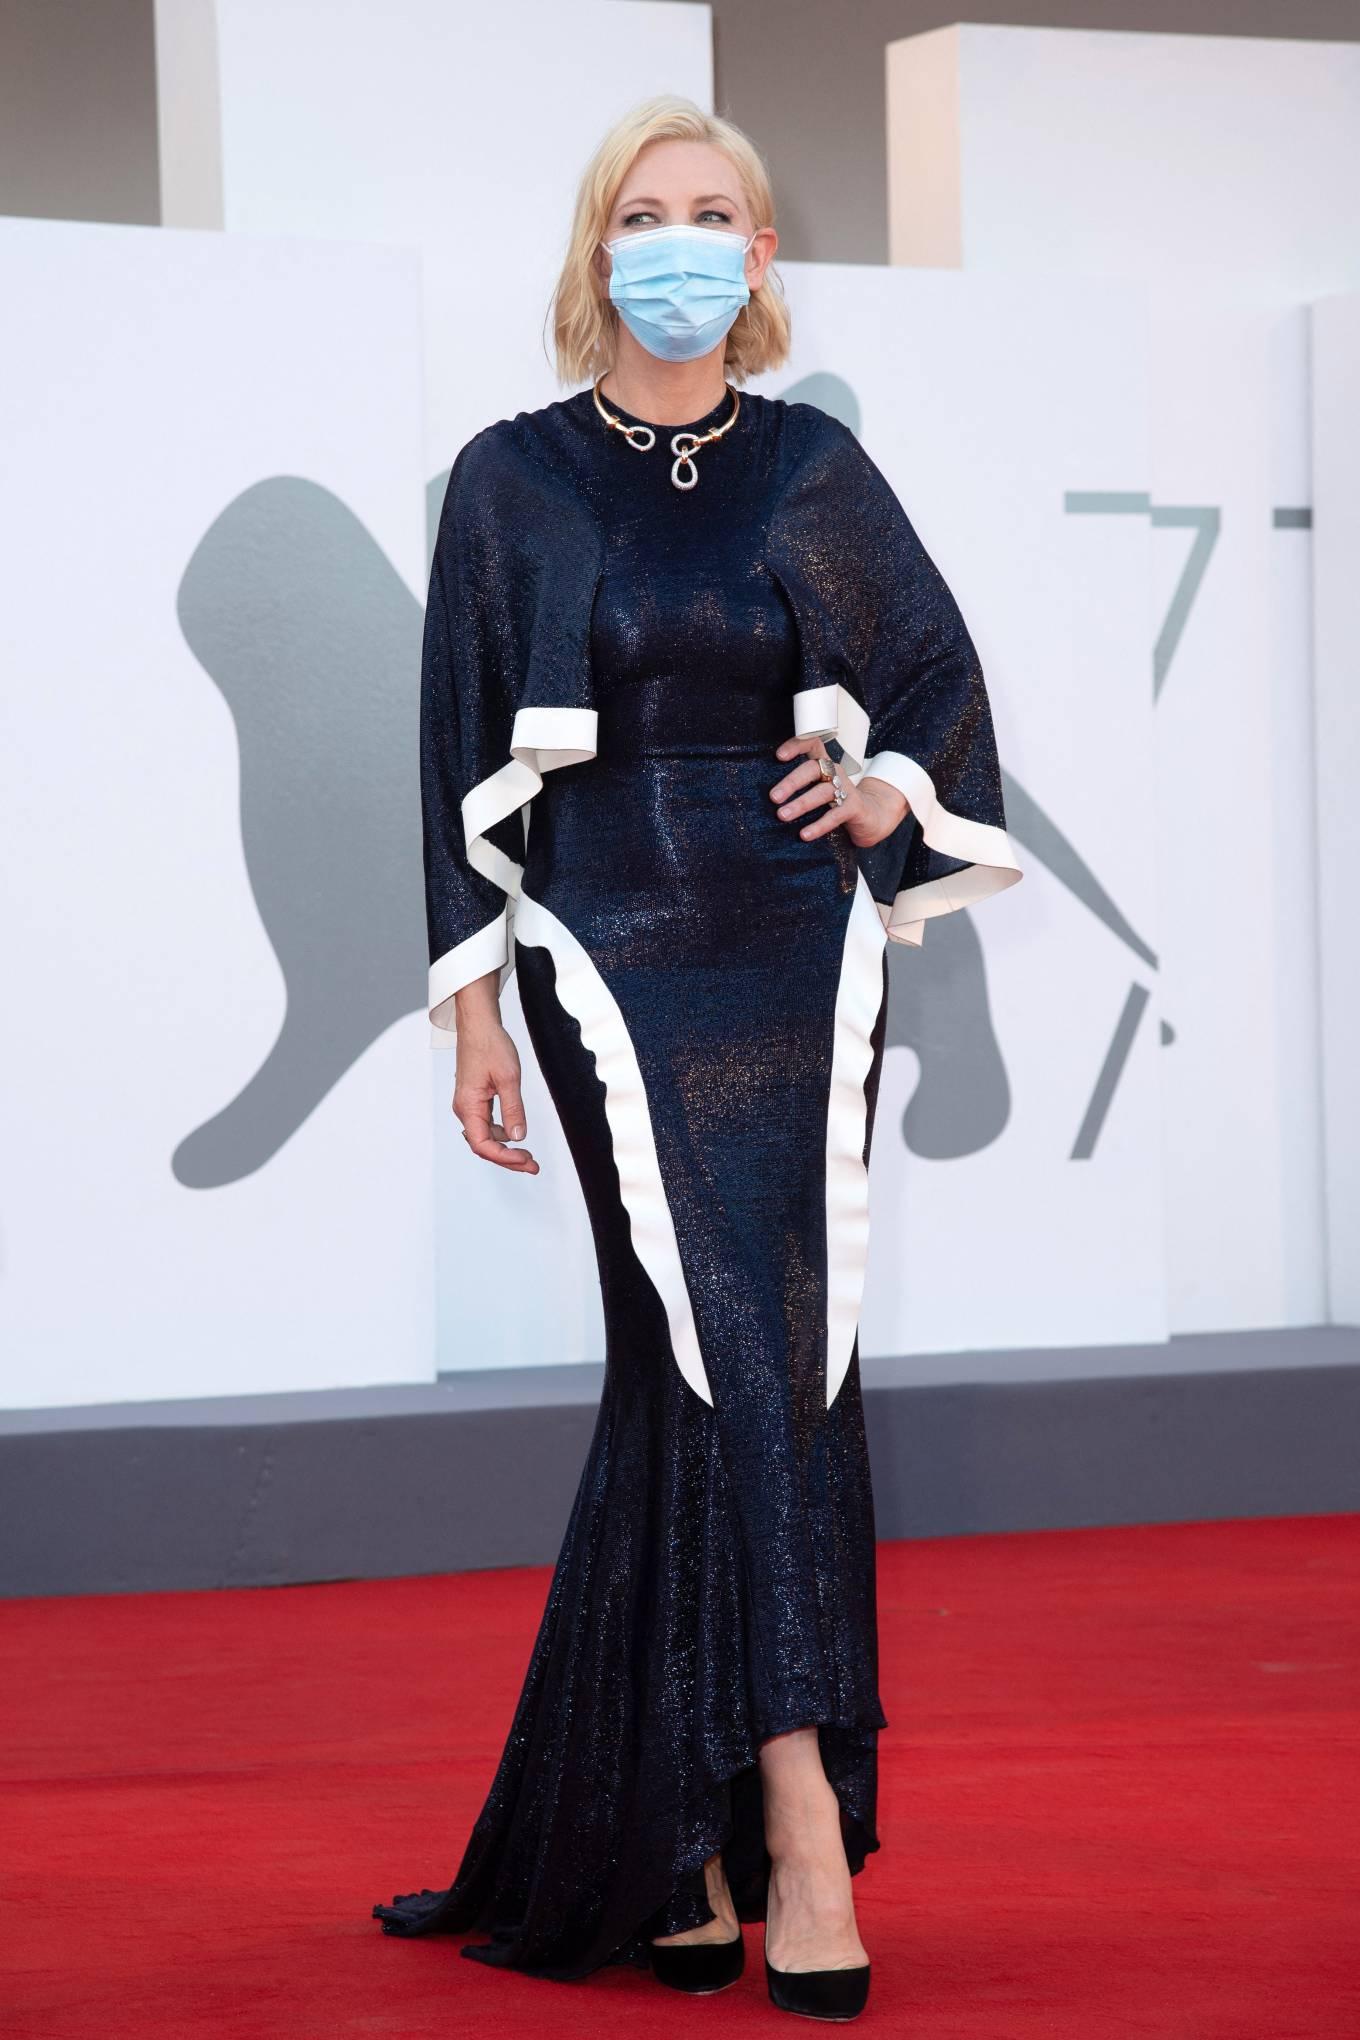 Cate Blanchett 2020 : Cate Blanchett attending Opening Ceremony at 2020 Venice International Film Festival – Italy-14